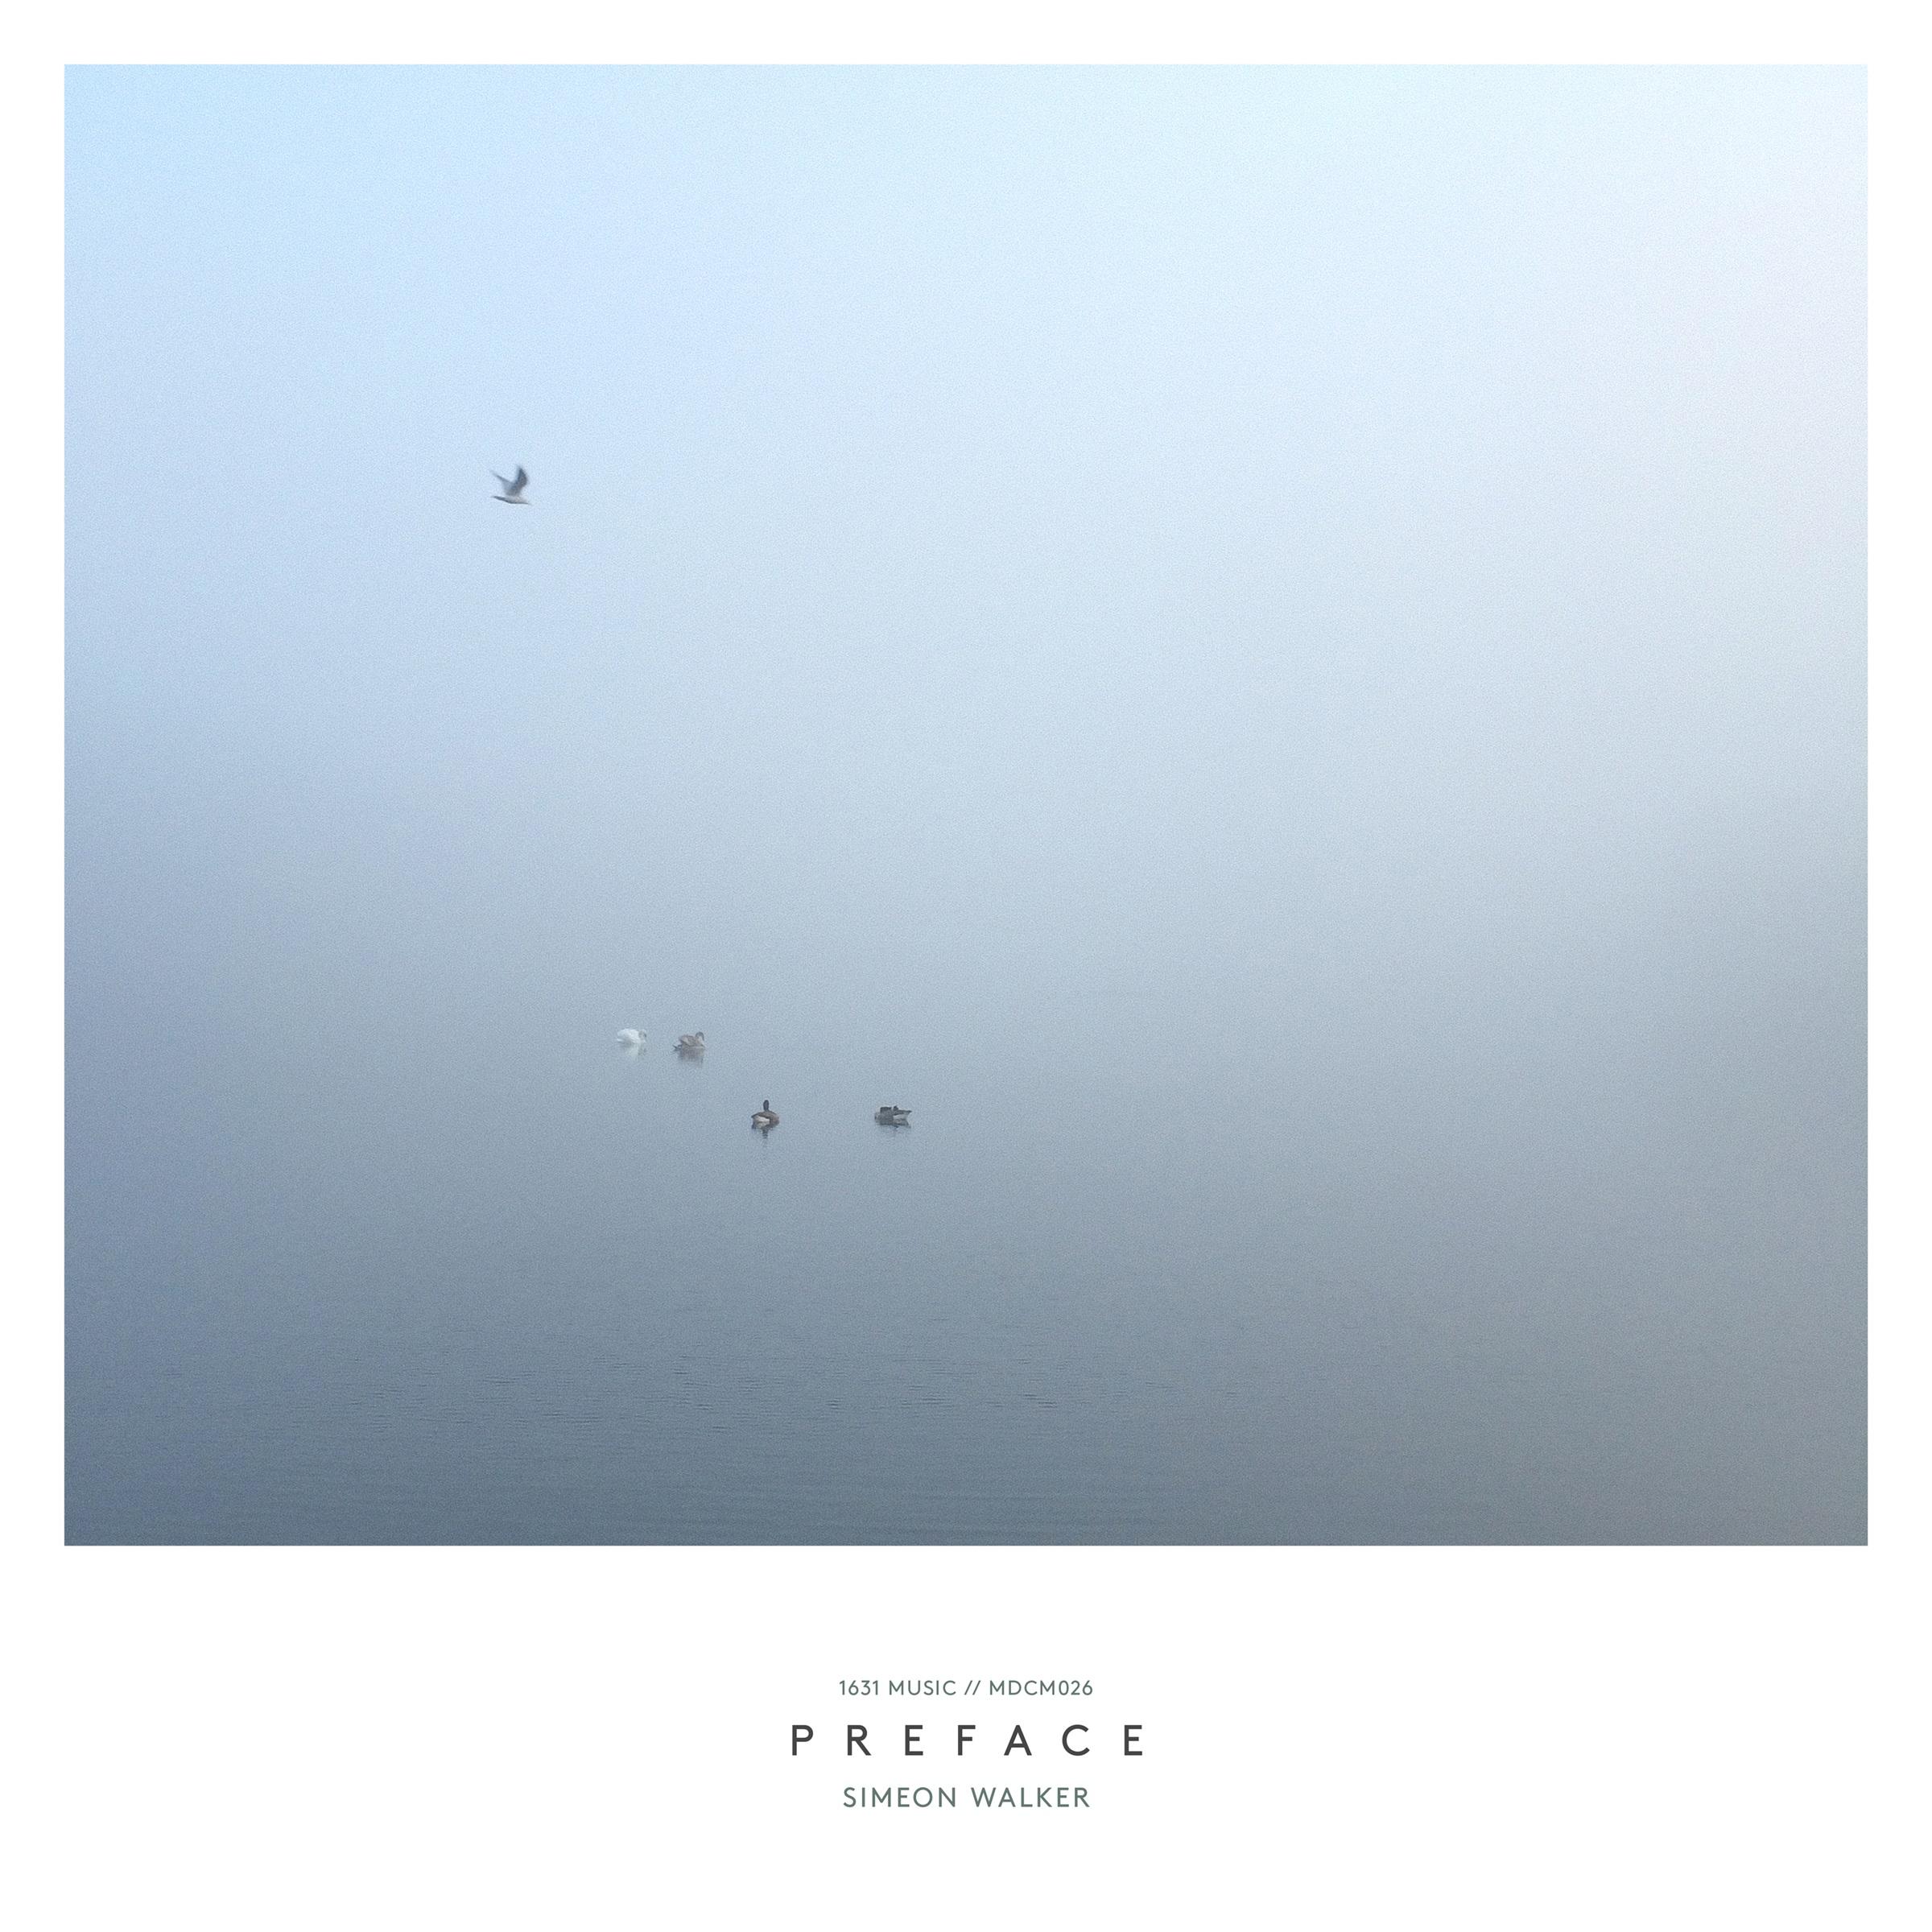 Preface EP cover.jpg